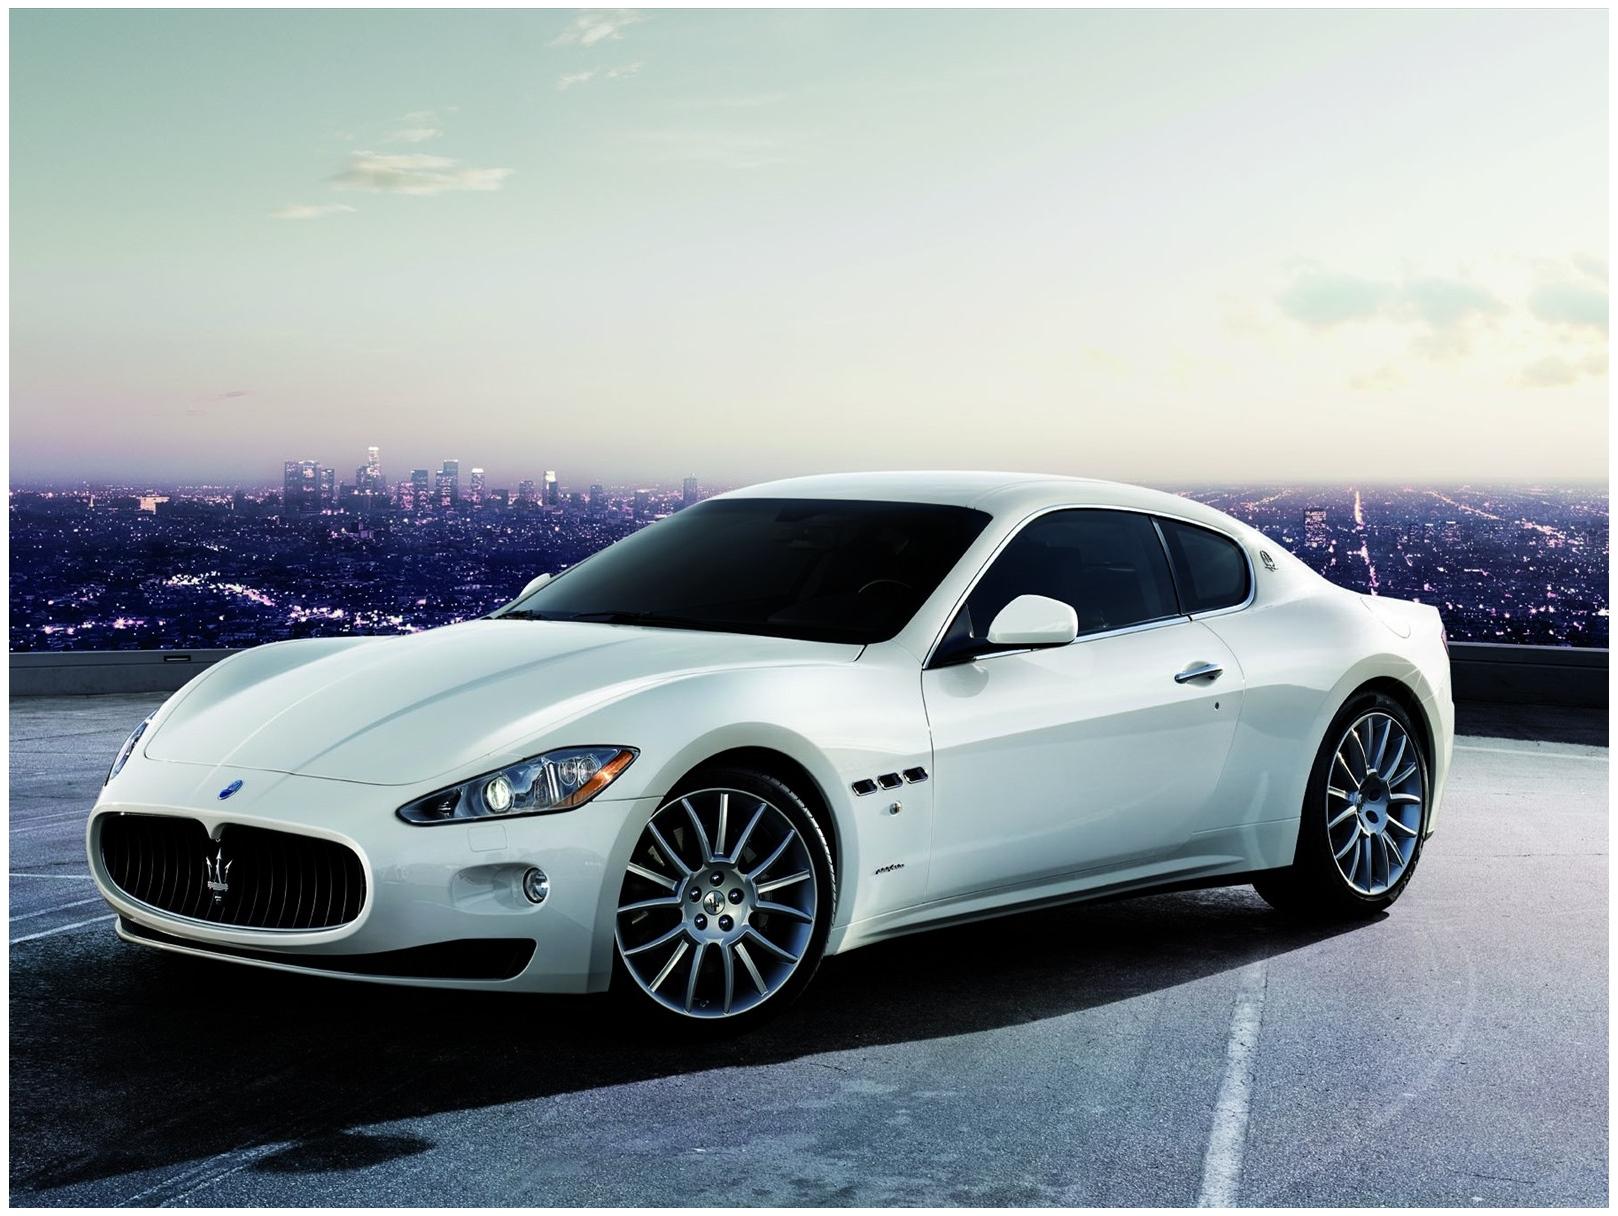 Best Maserati Granturismo Hd Wallpaper download